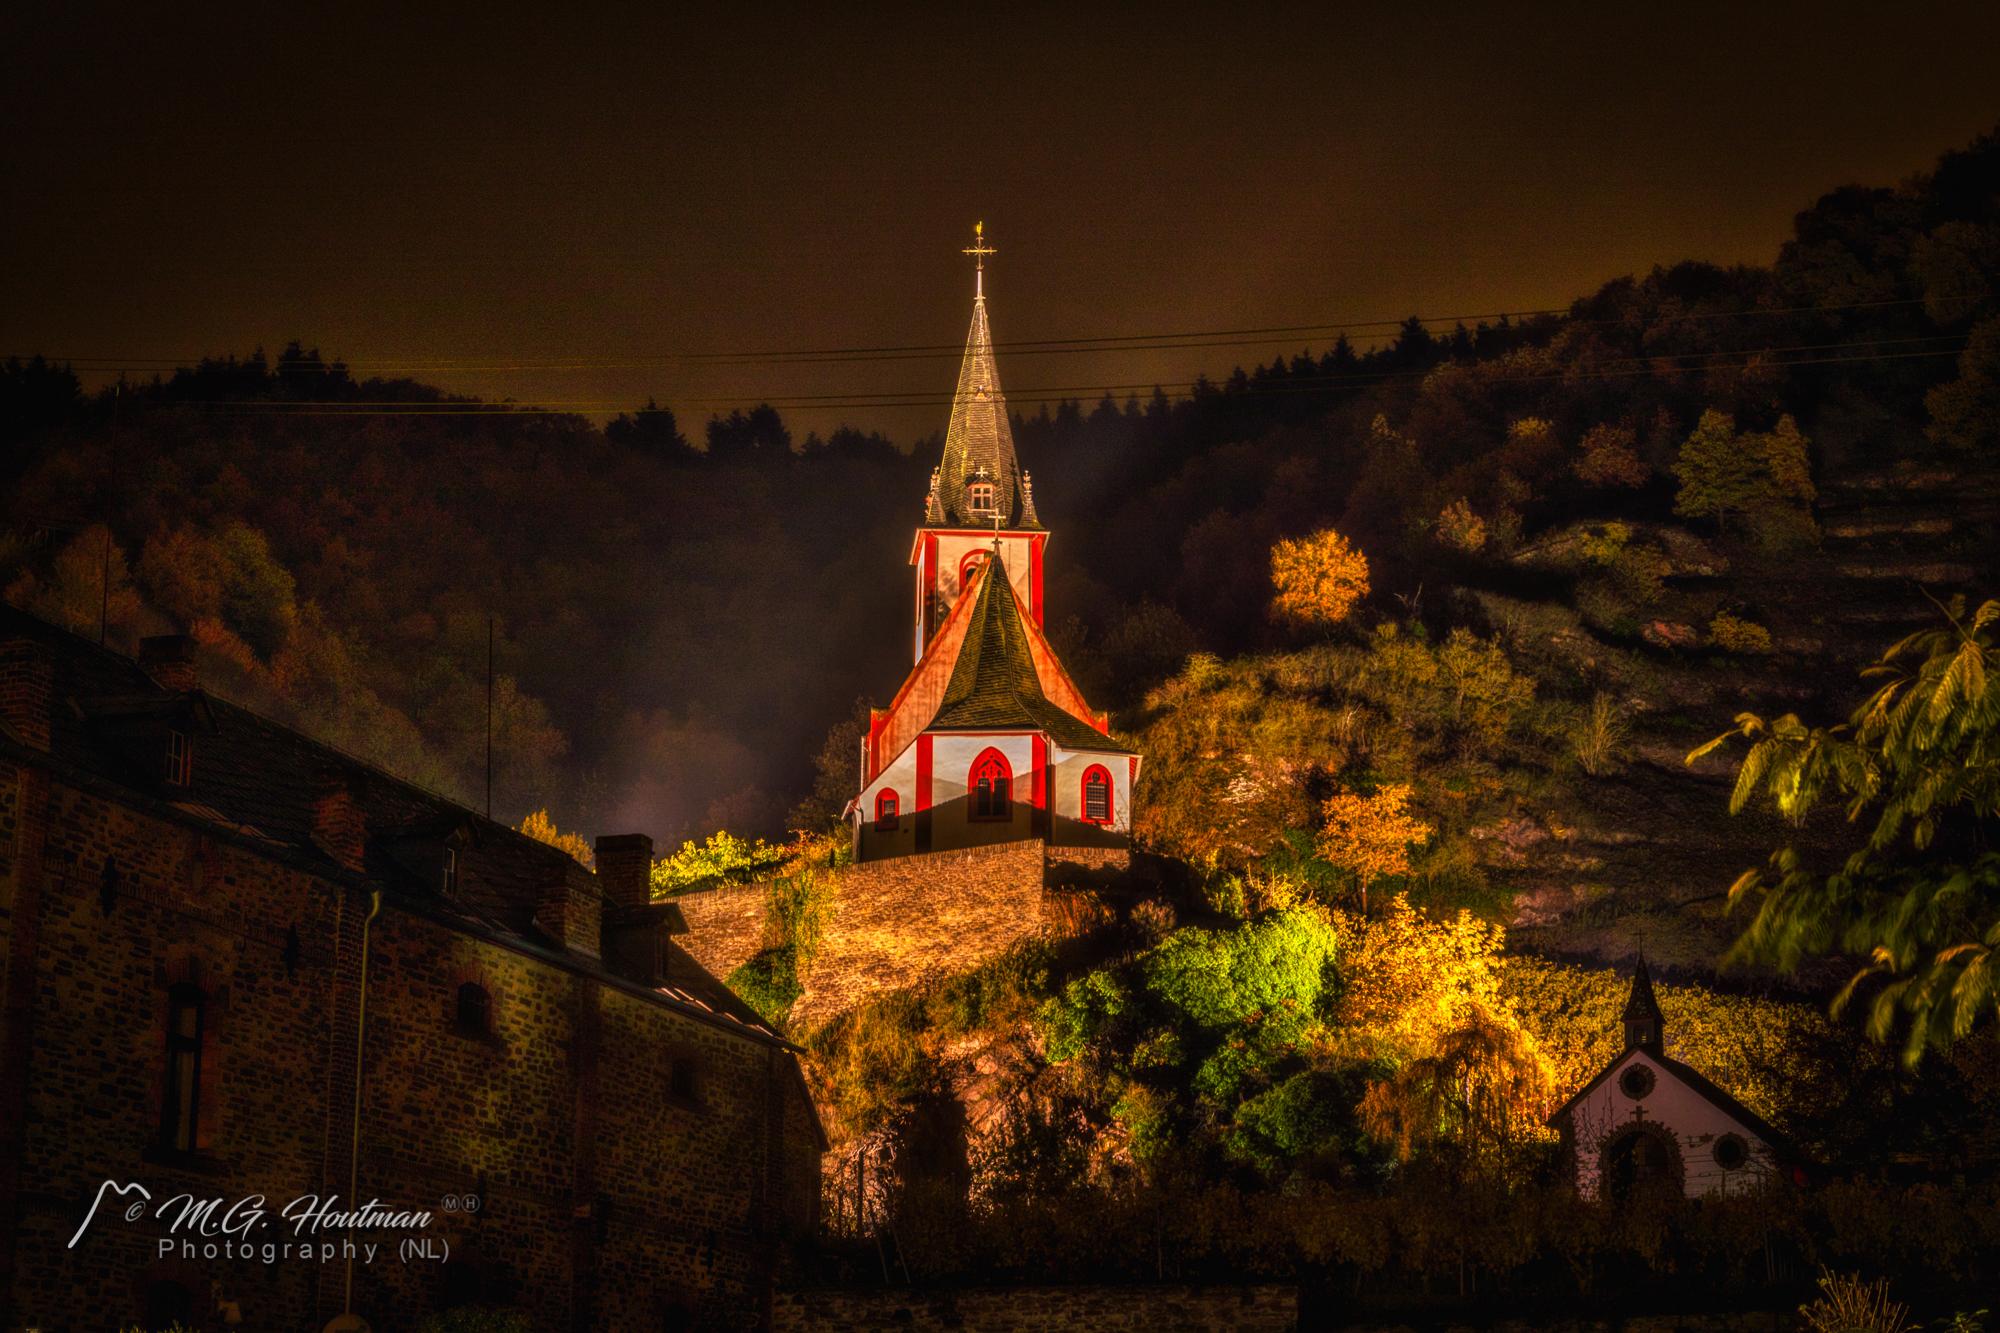 Pfarrkirche St. Johannes - Hatzenport (D)